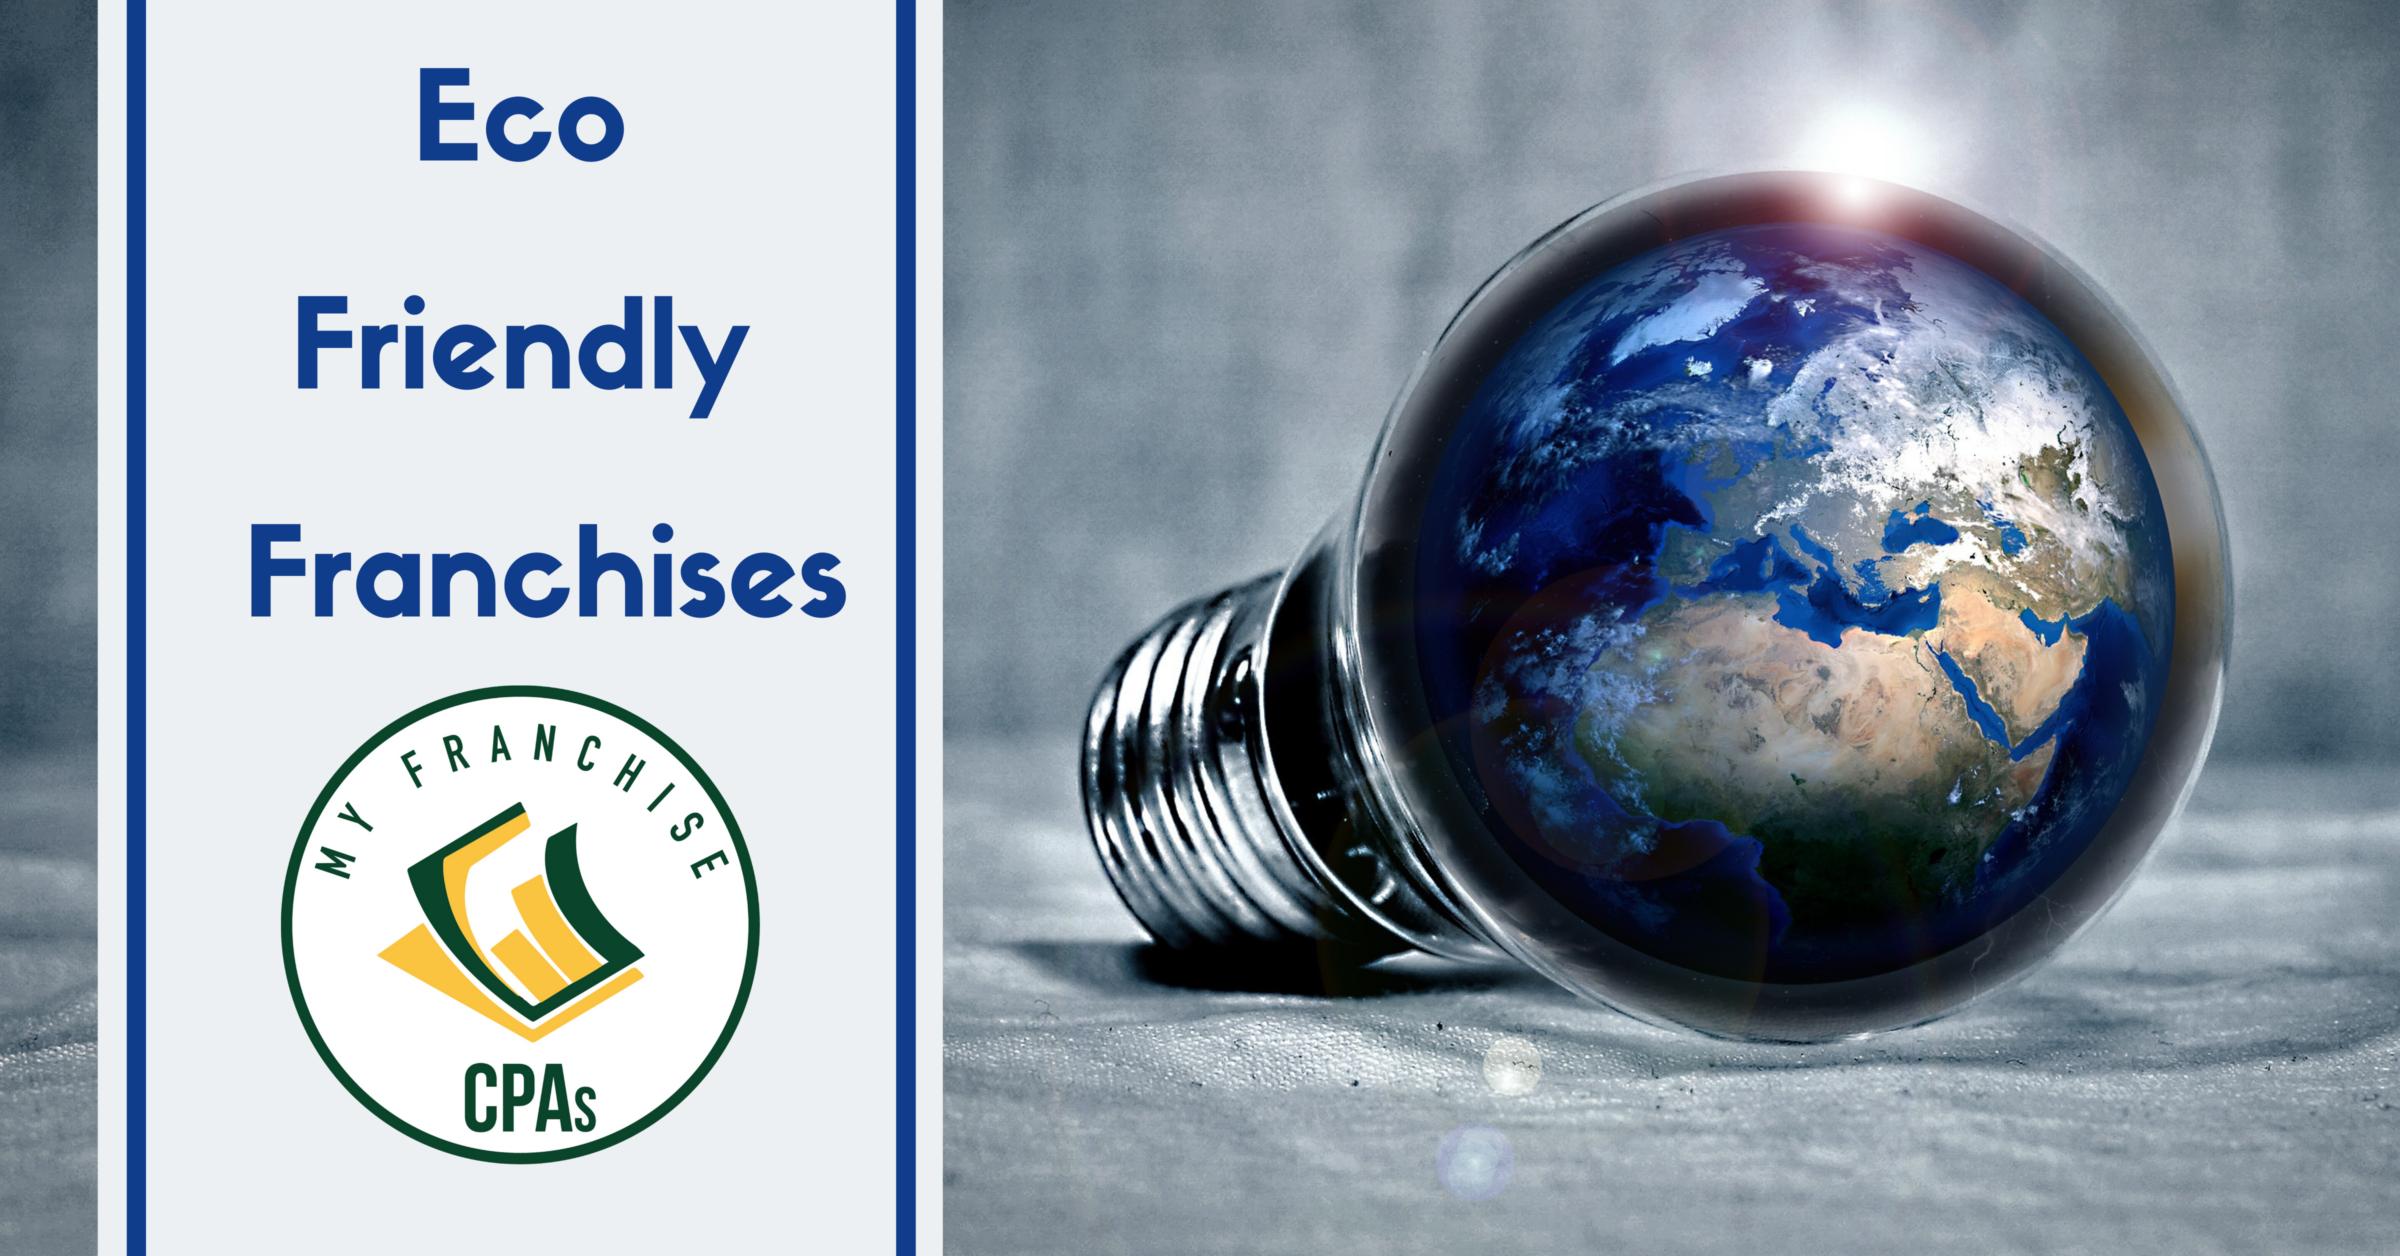 Eco Friendly Franchises, Green Franchises